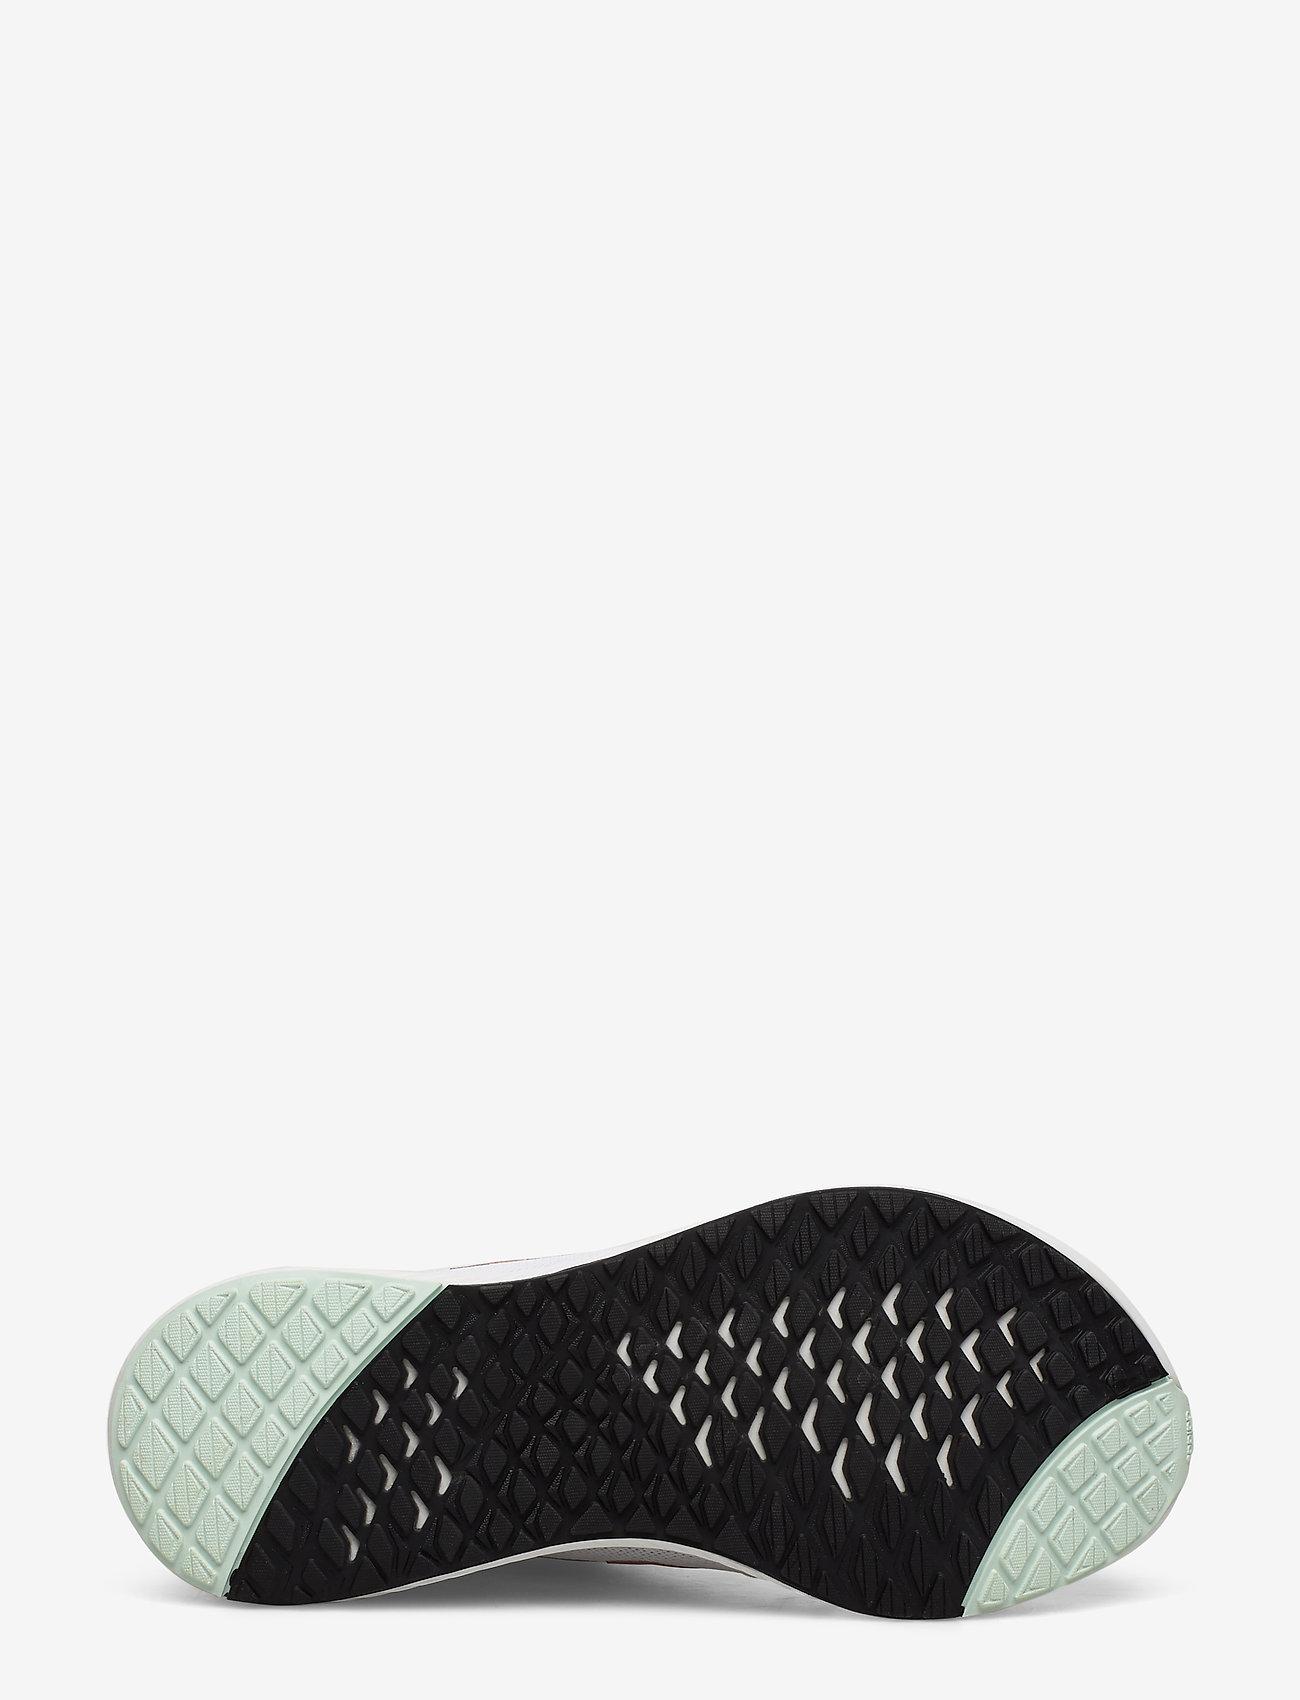 Edge Lux 3 W (Ftwwht/copmt/dshgrn) - adidas Performance